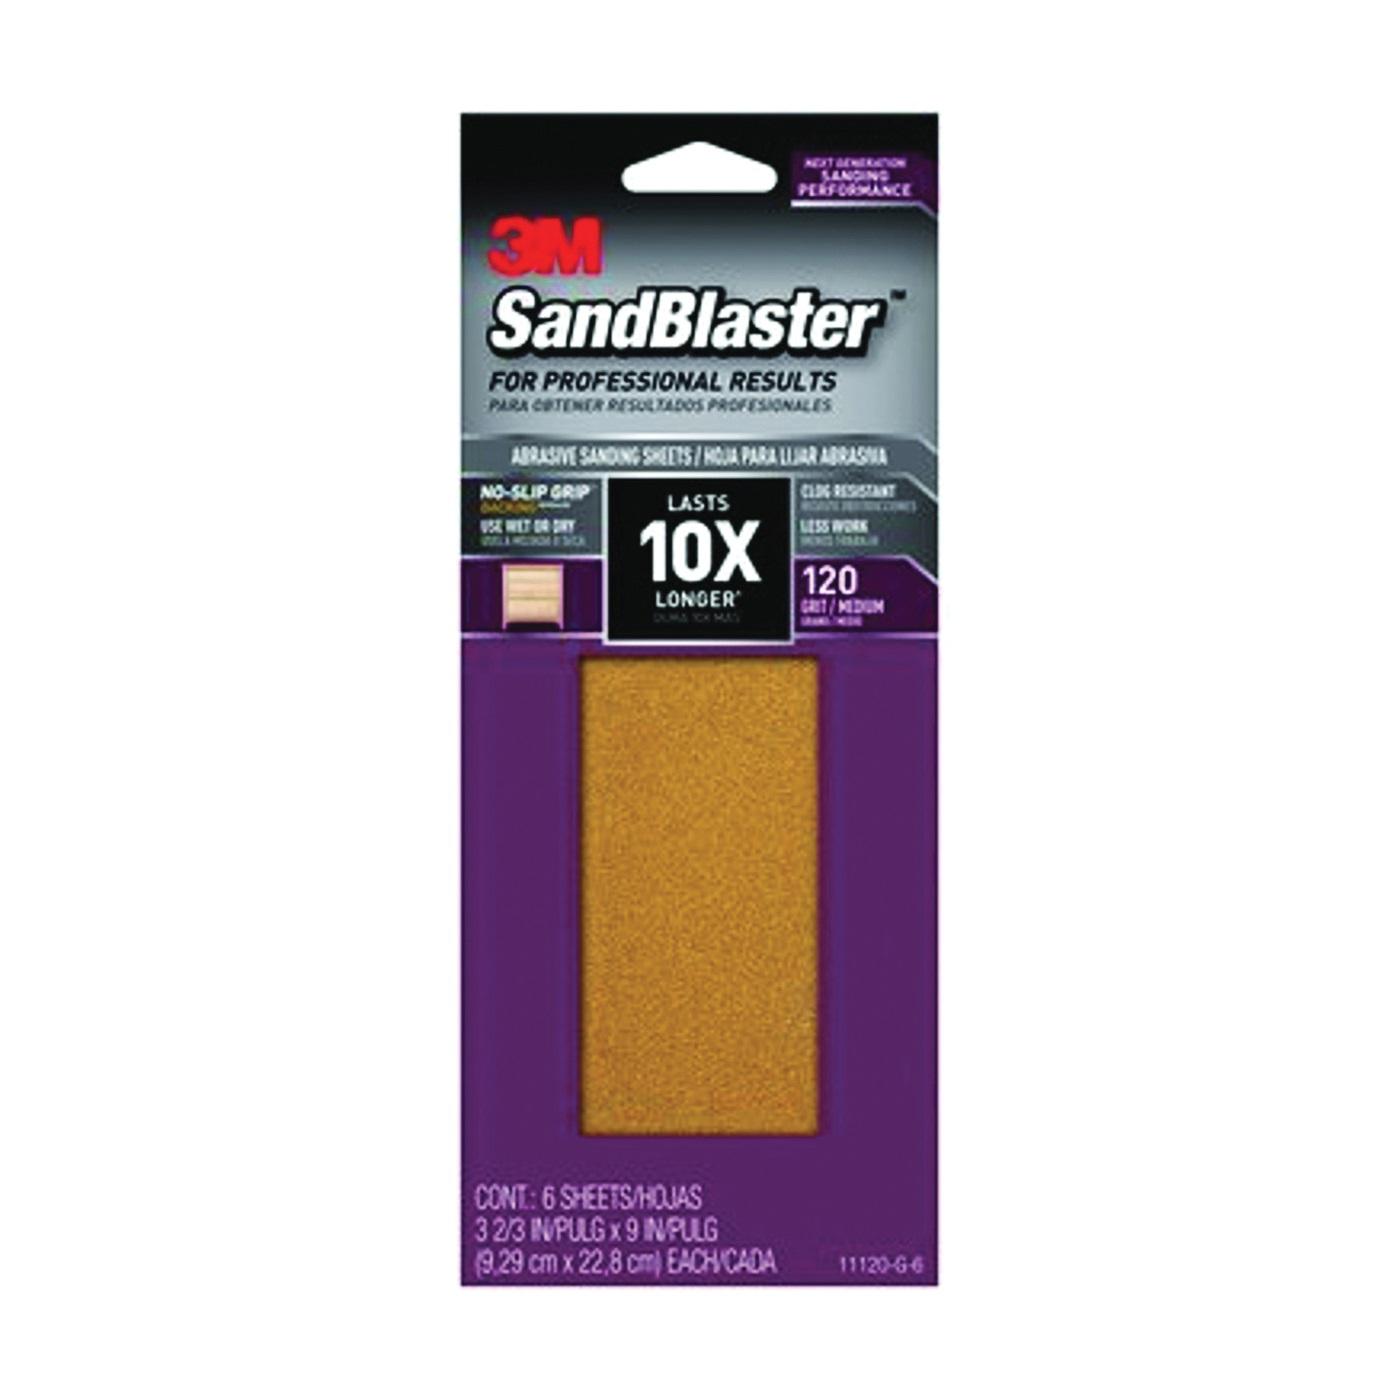 Picture of 3M SandBlaster 11120-G-6 Sandpaper, 9 in L, 3-2/3 in W, 120 Grit, Medium, Aluminum Oxide Abrasive